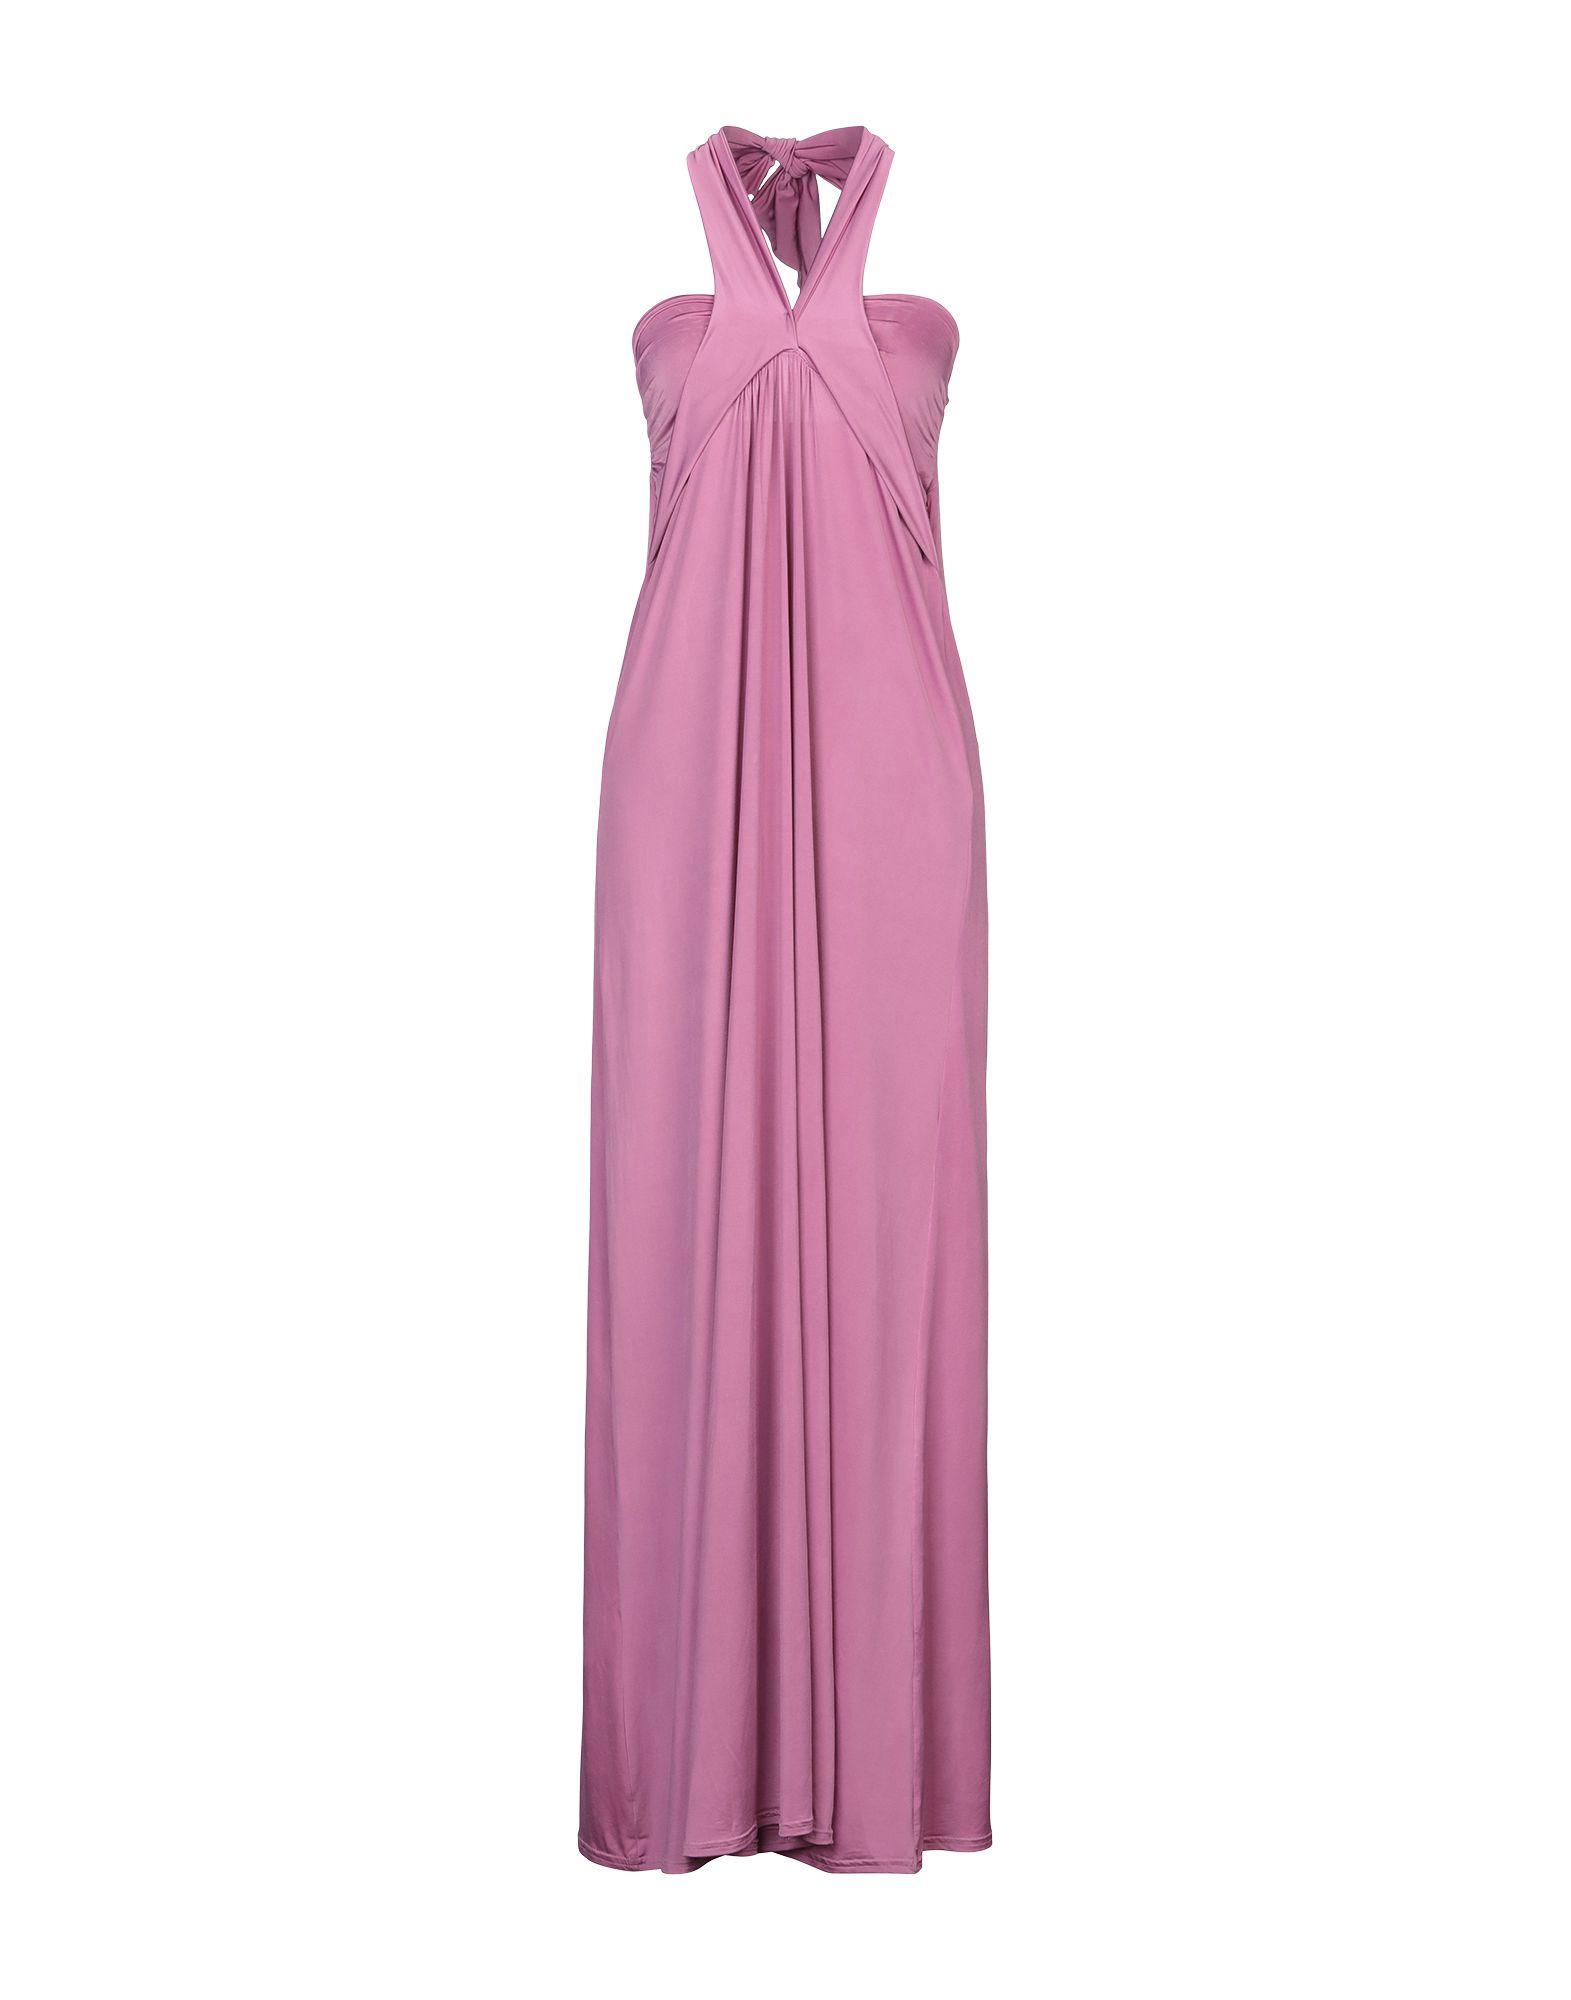 VAPOFORNO MILANO Длинное платье